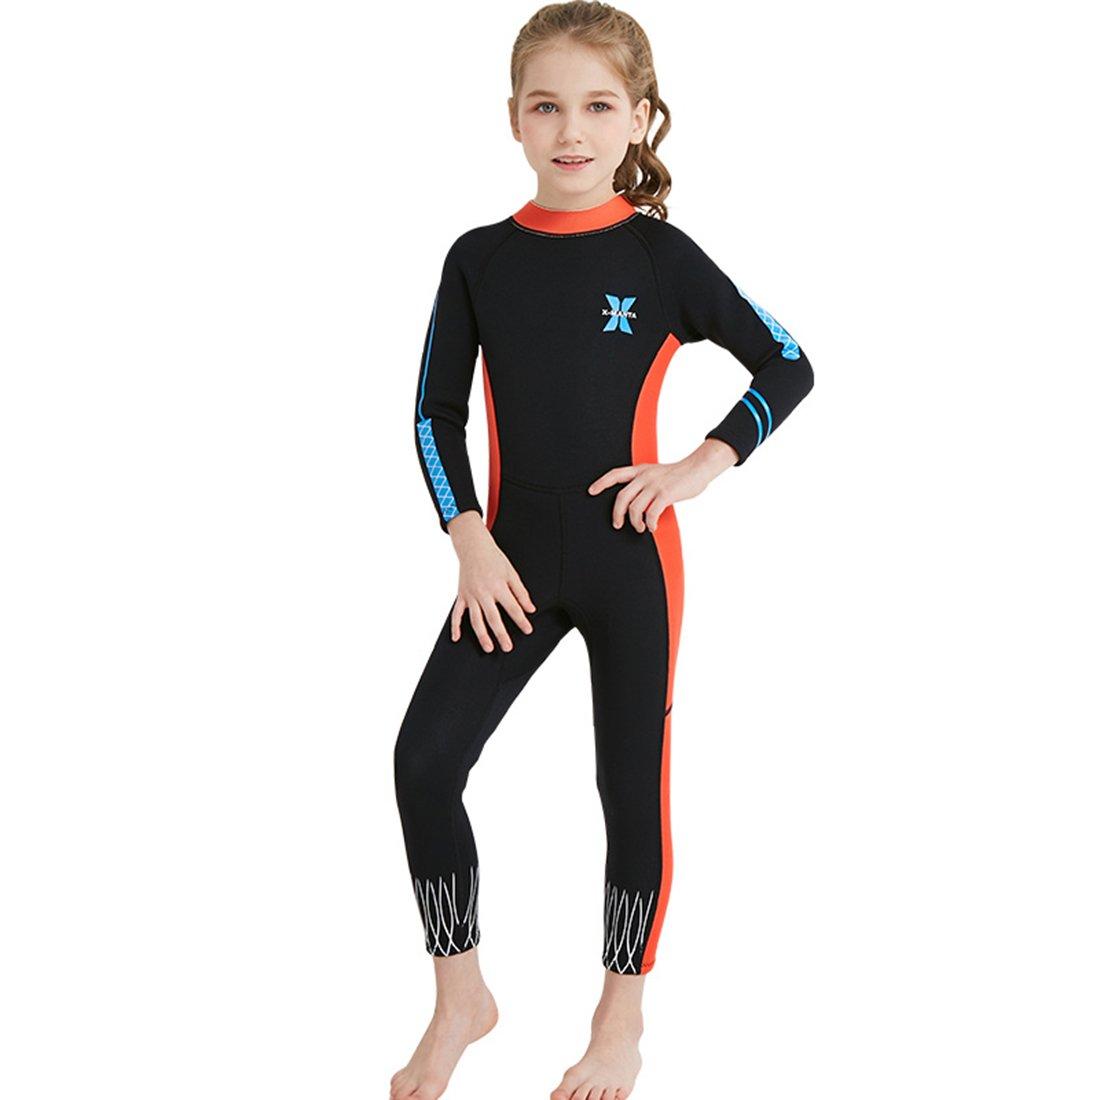 536db37fb1 Amazon.com  Nataly Osmann Full Wetsuit for Girls